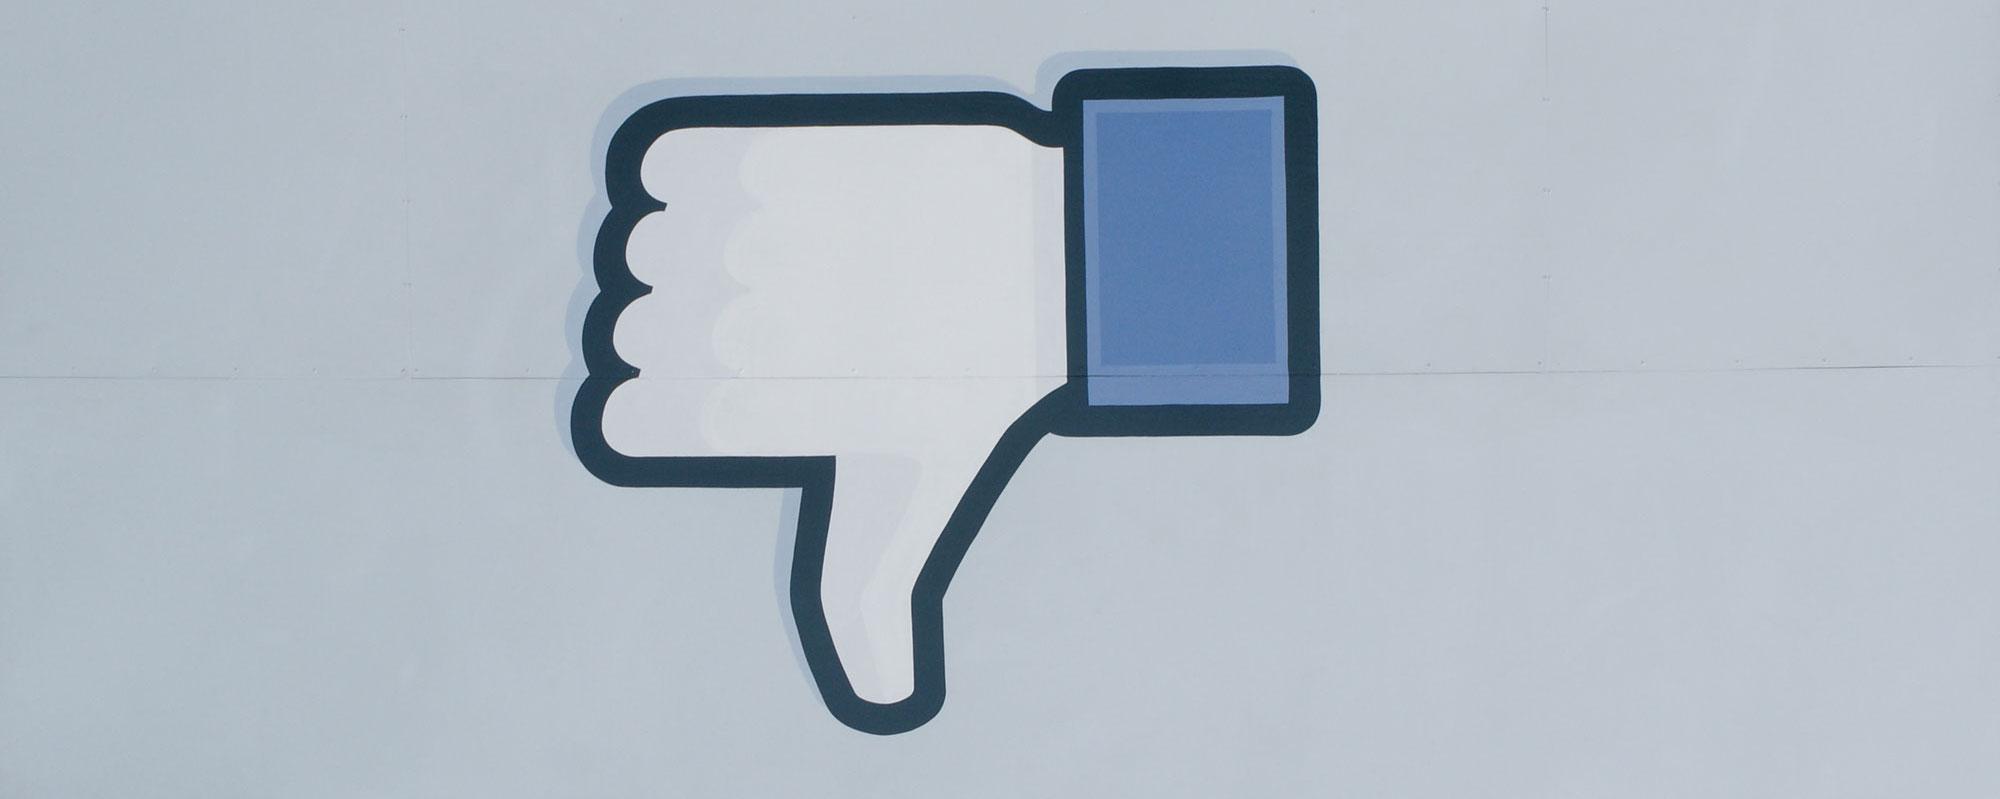 Facebook Now Allows You To Report False News